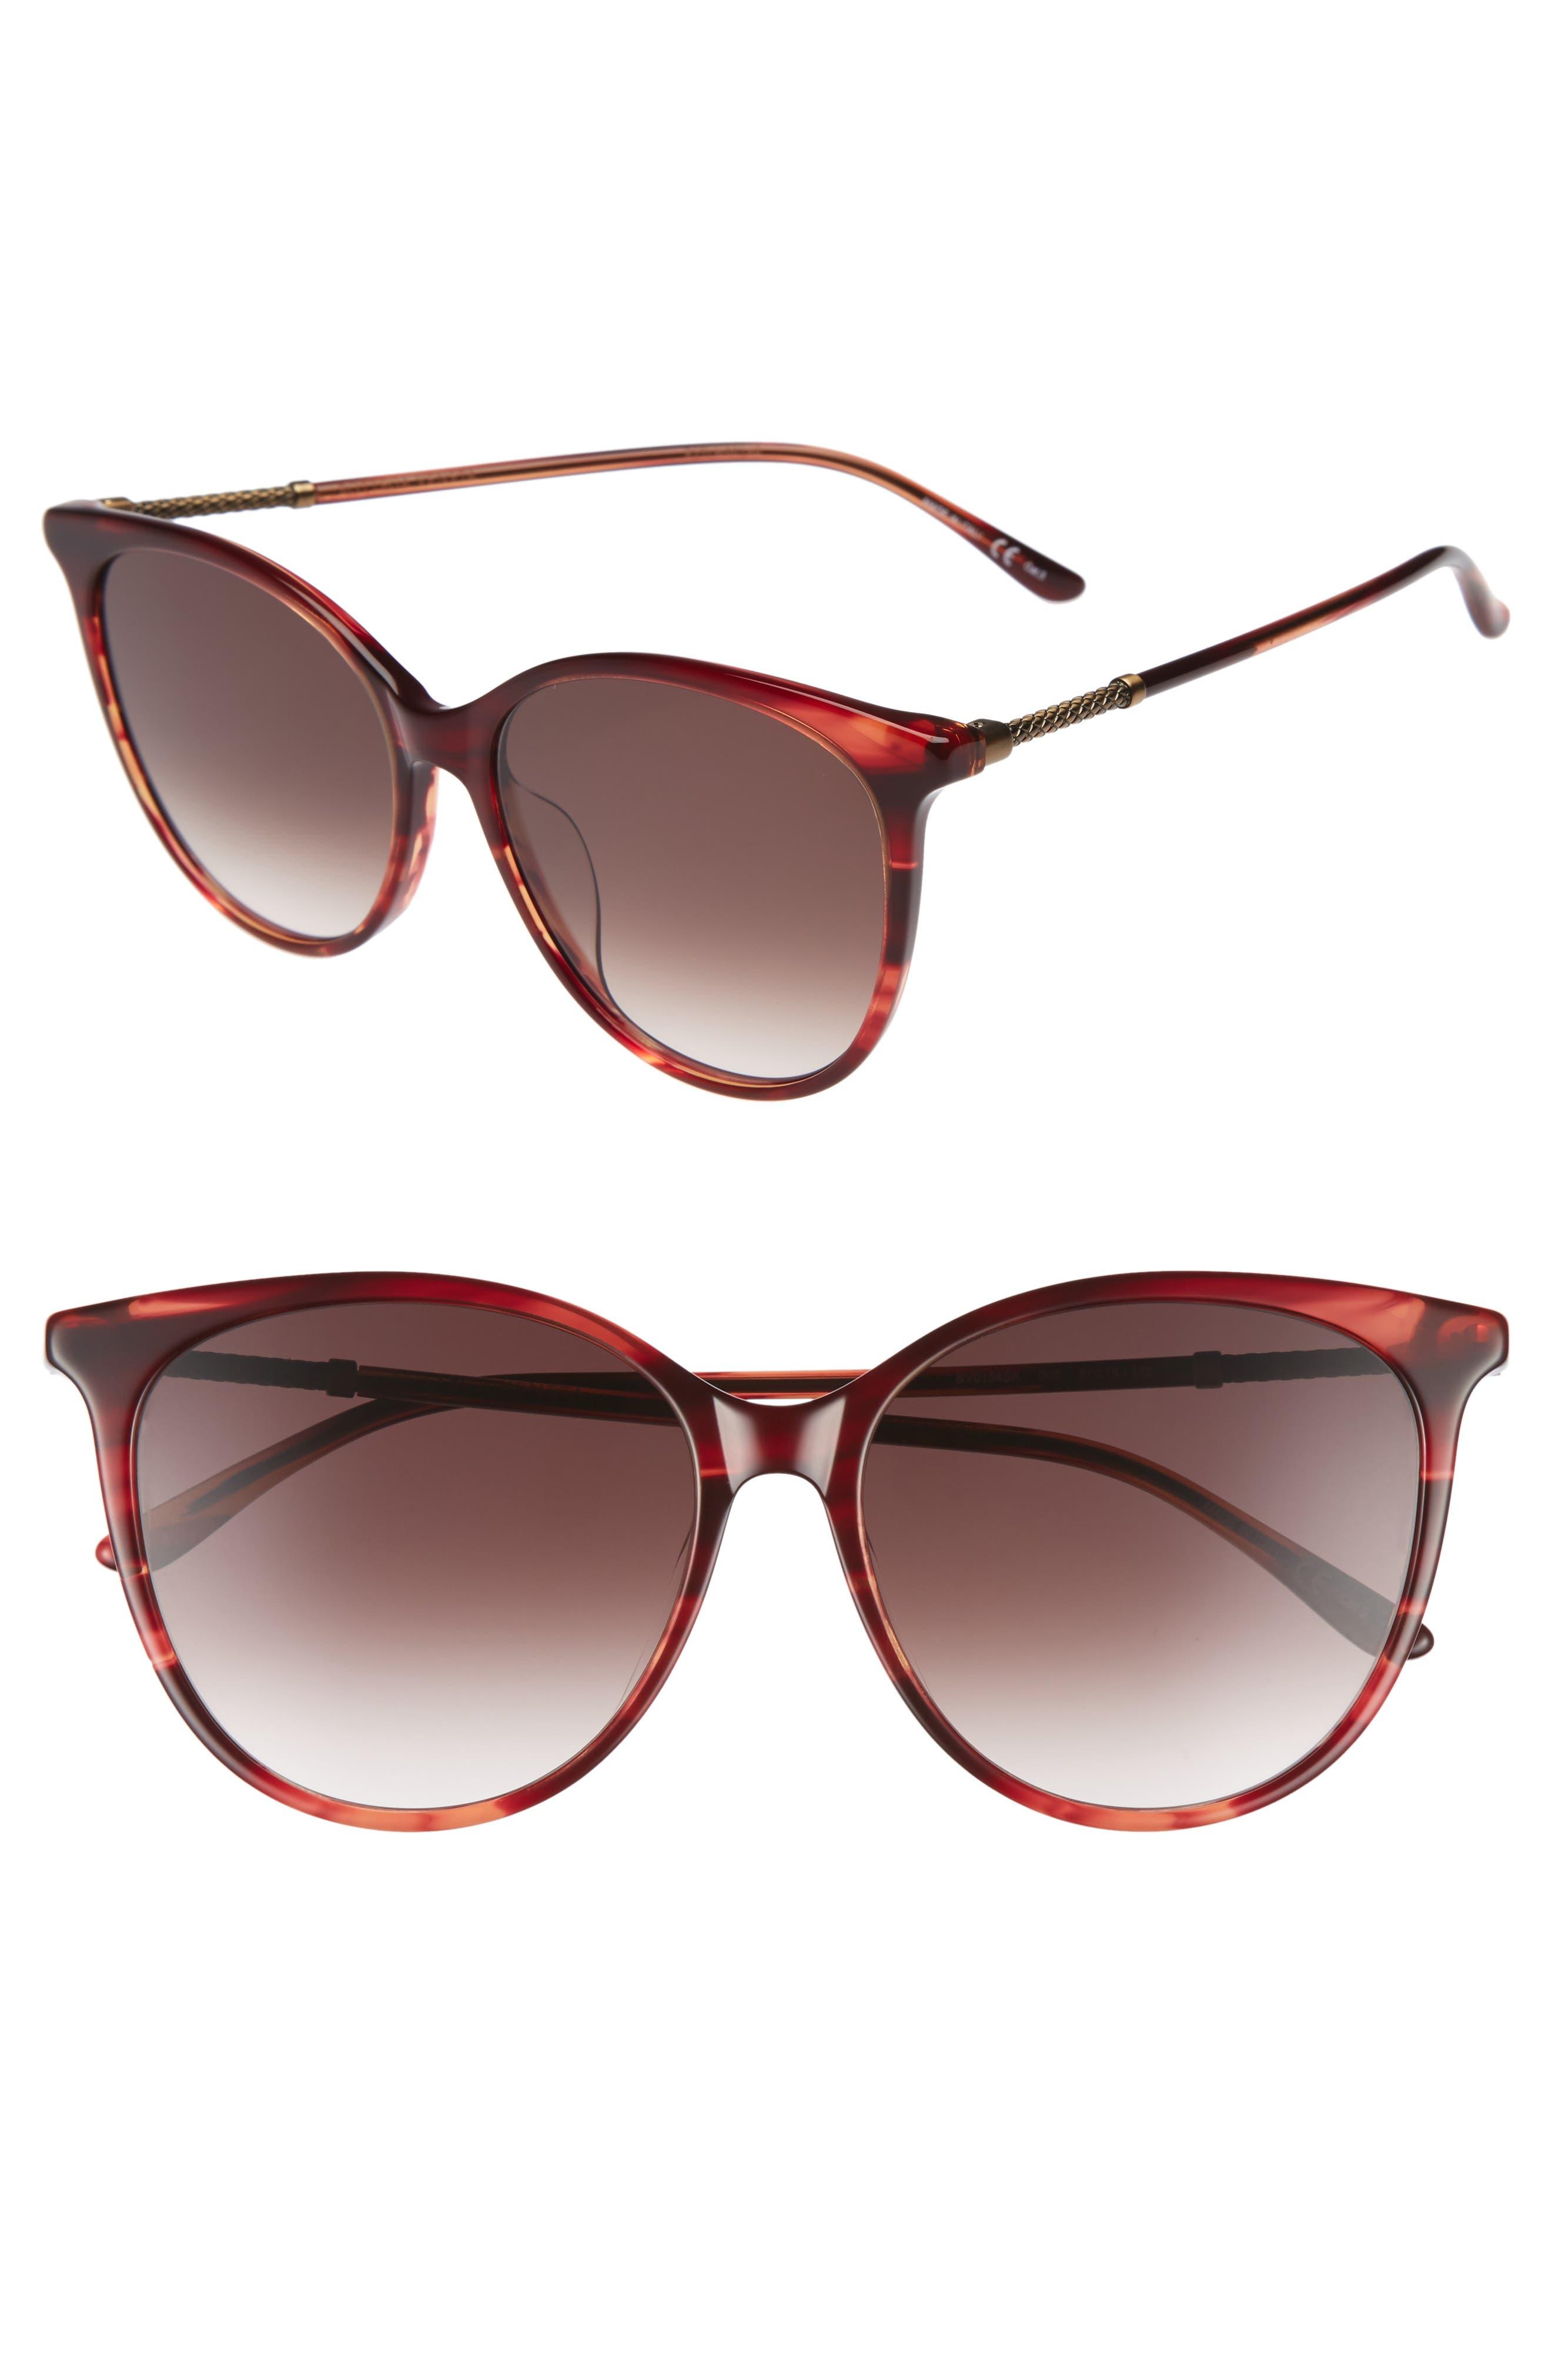 Main Image - Bottega Veneta 57mm Cat Eye Sunglasses